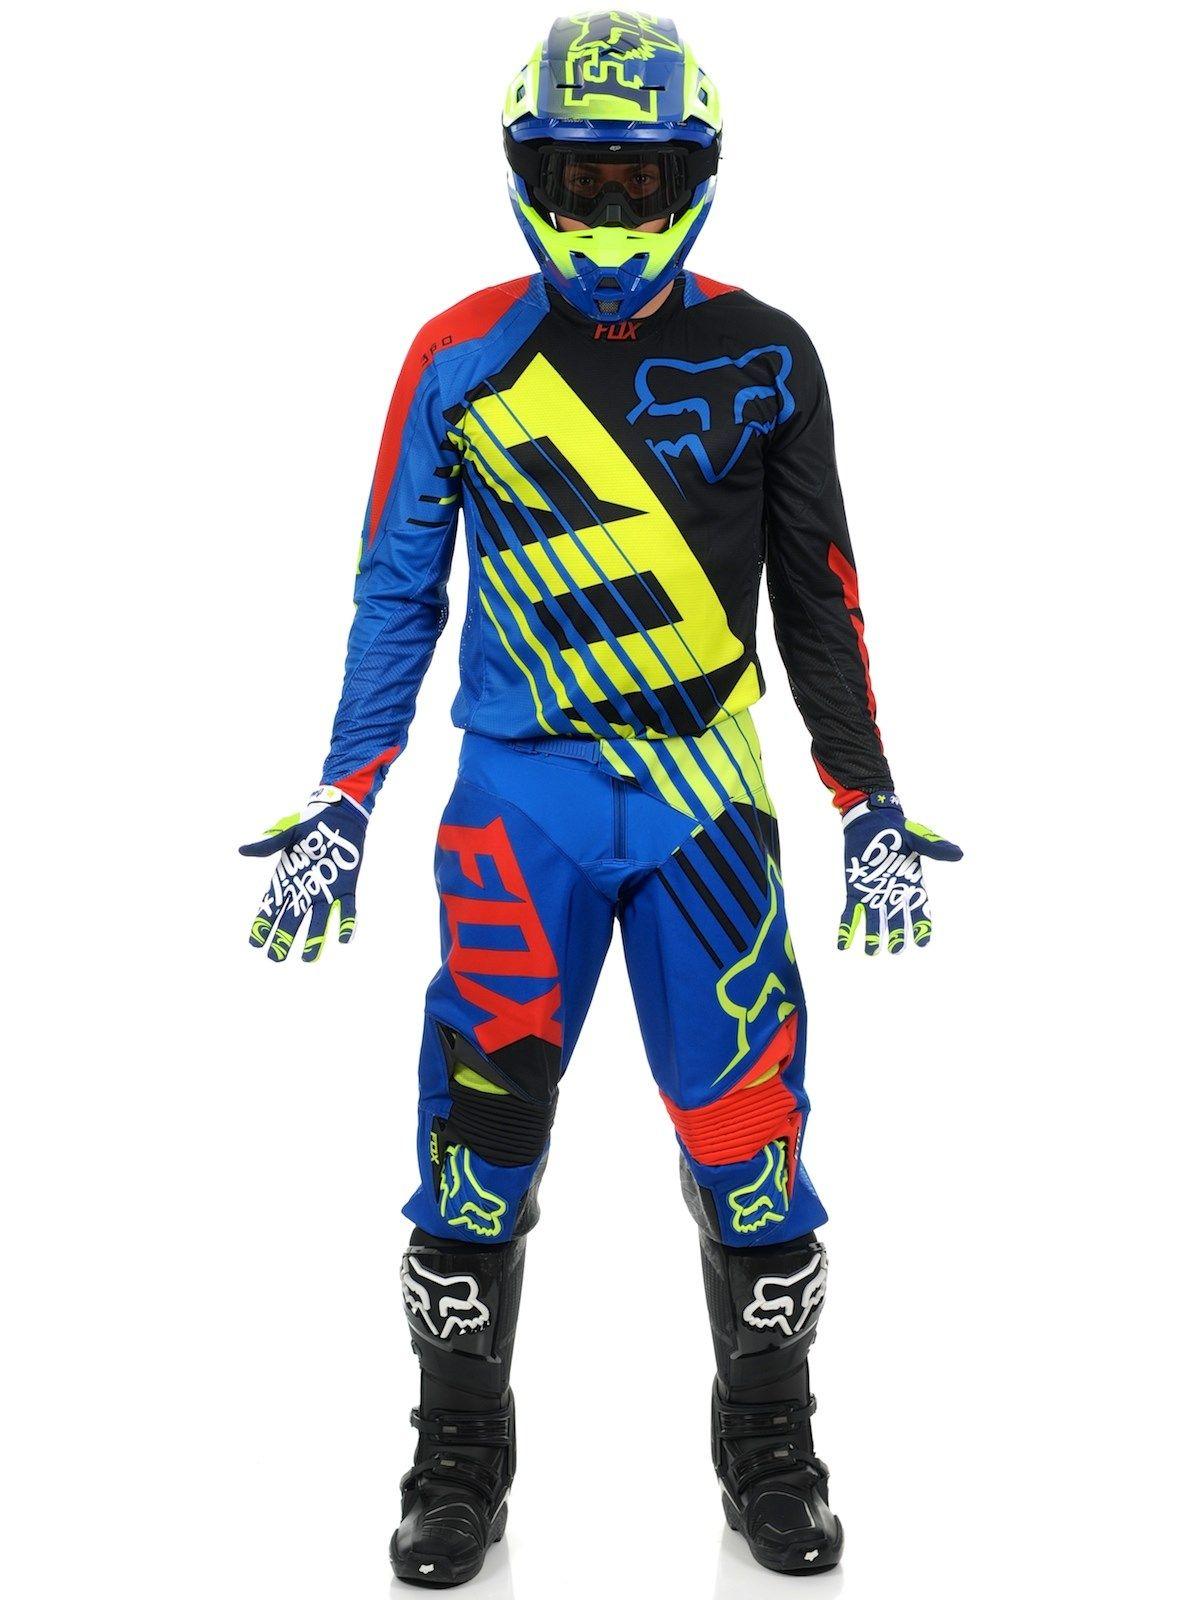 7a0c22dcc Fox Blue 2015 360 Savant MX Jersey